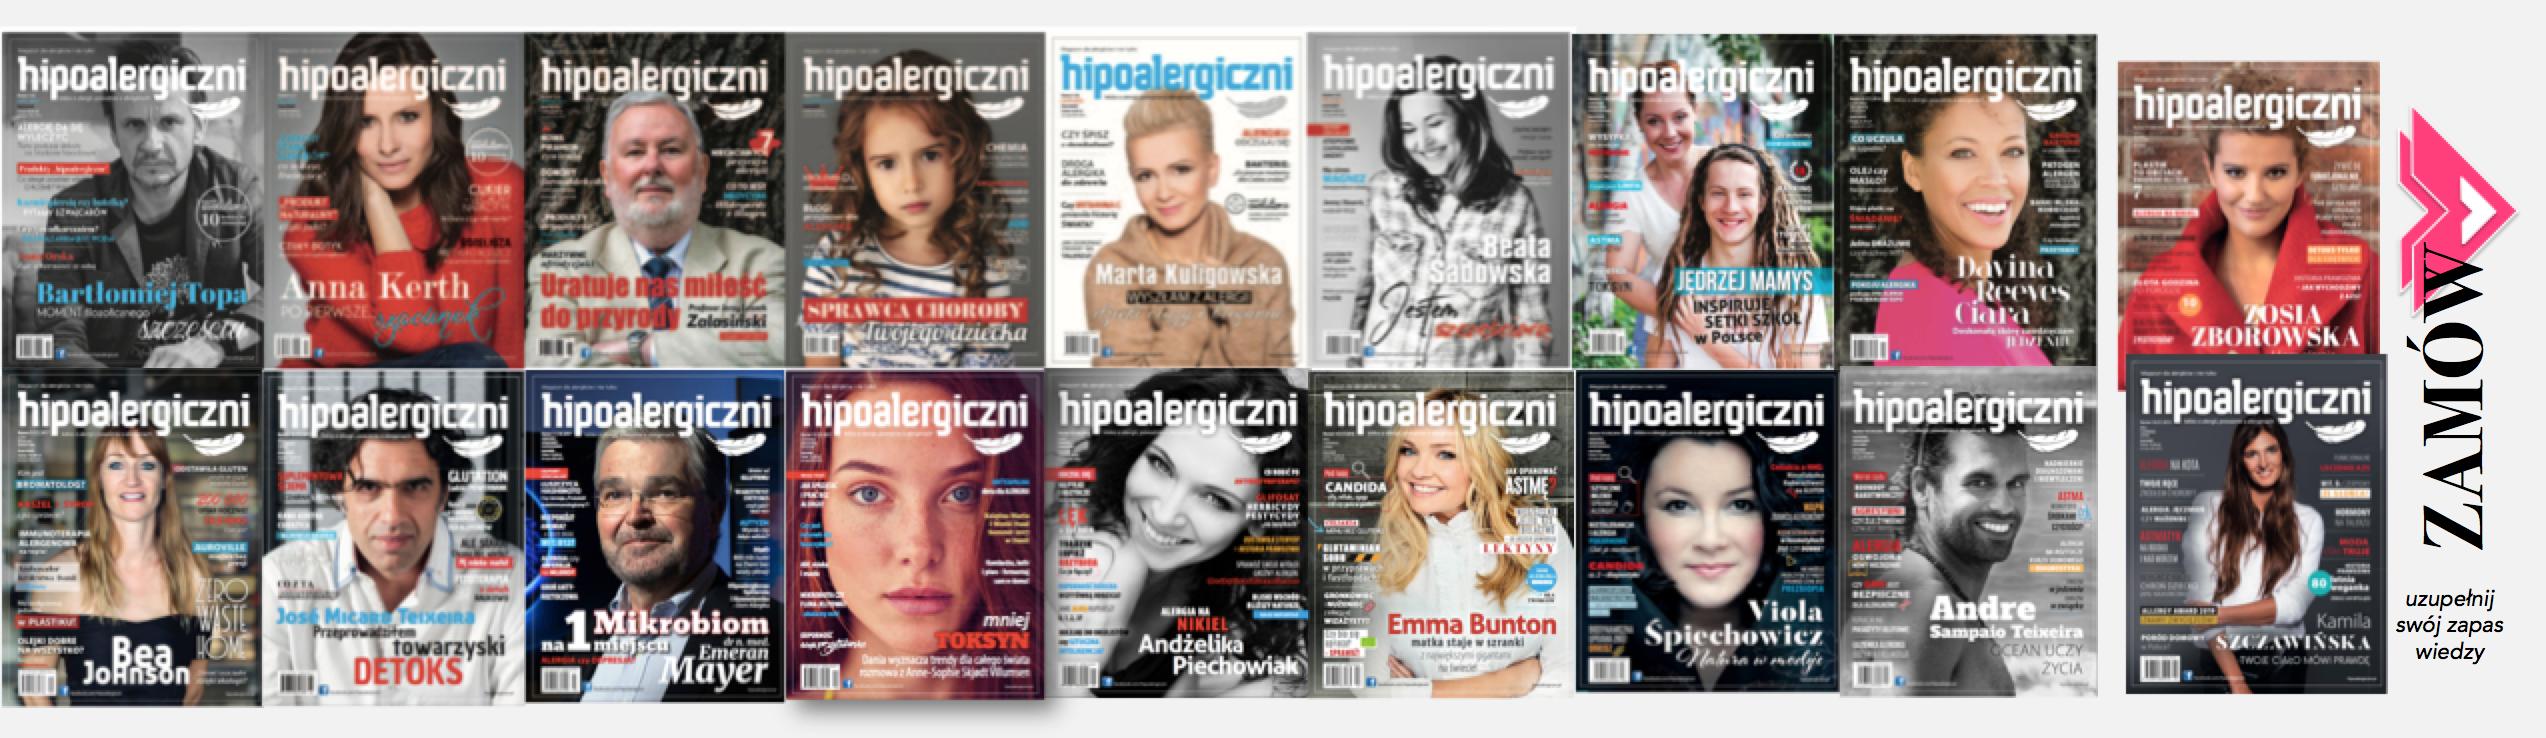 Magazyn-hipoalergiczni-pakiet-konesera-zaneta-geltz